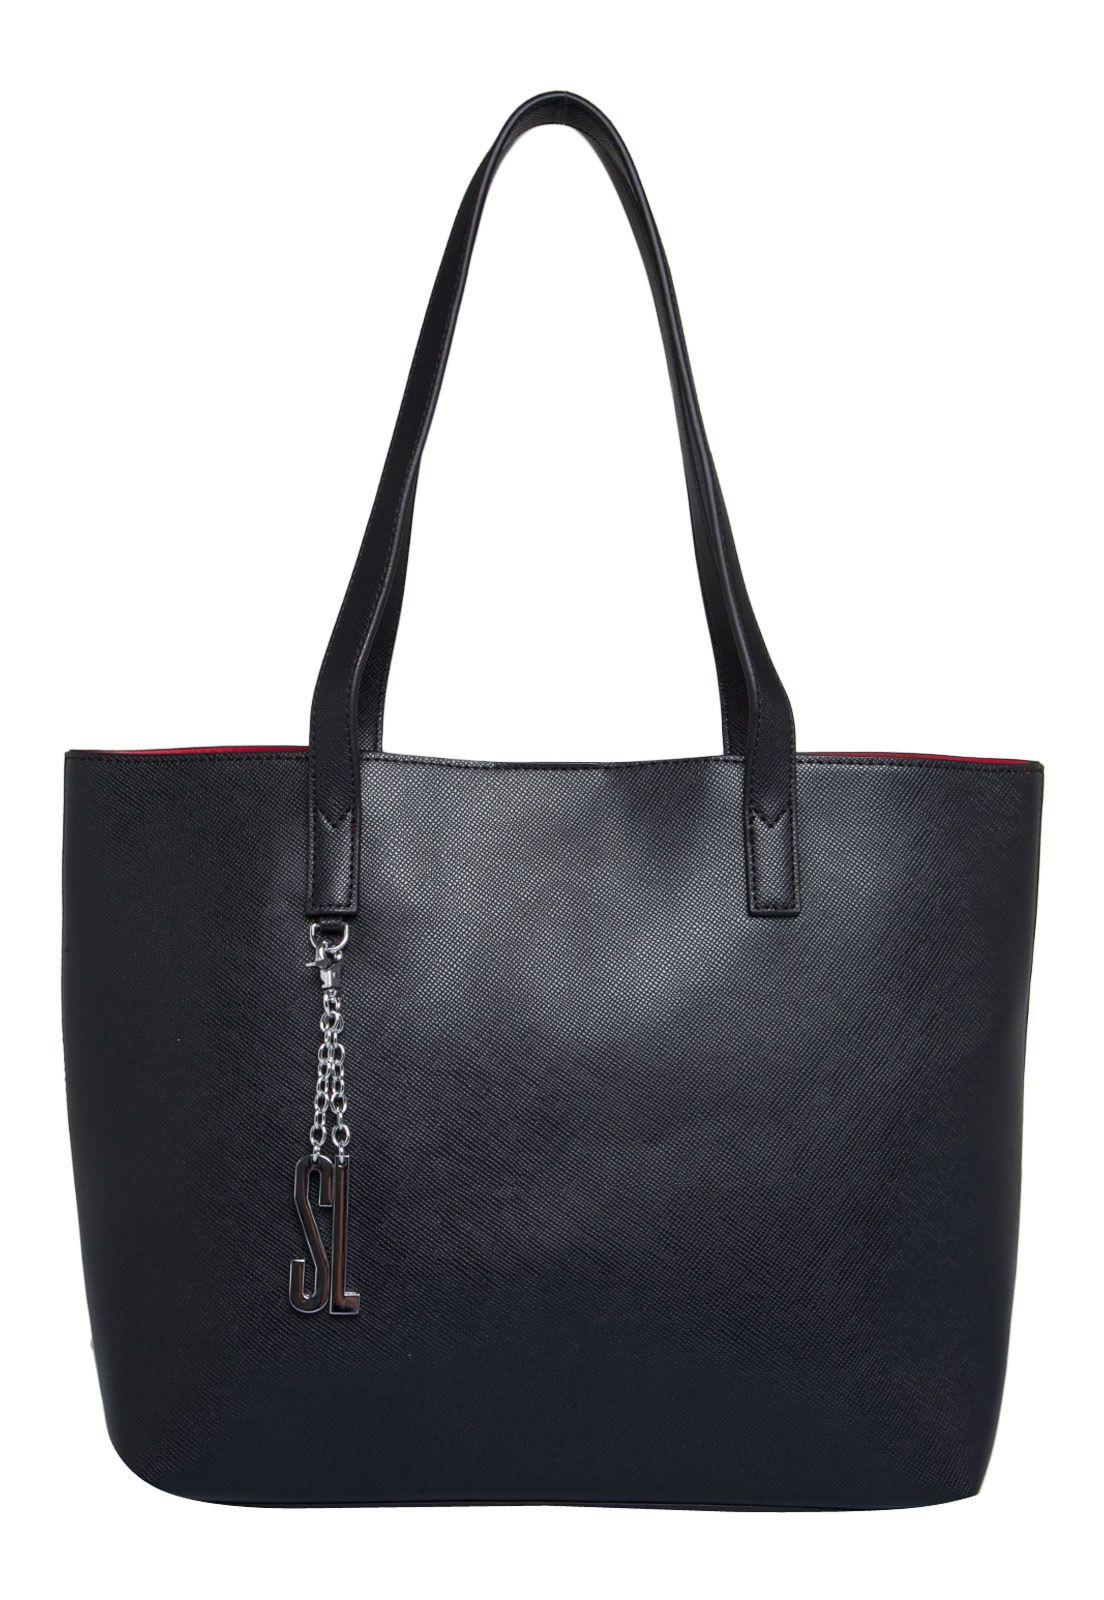 Bolsa Dourada Santa Lolla : Bolsa santa lolla sacola preta marca looks